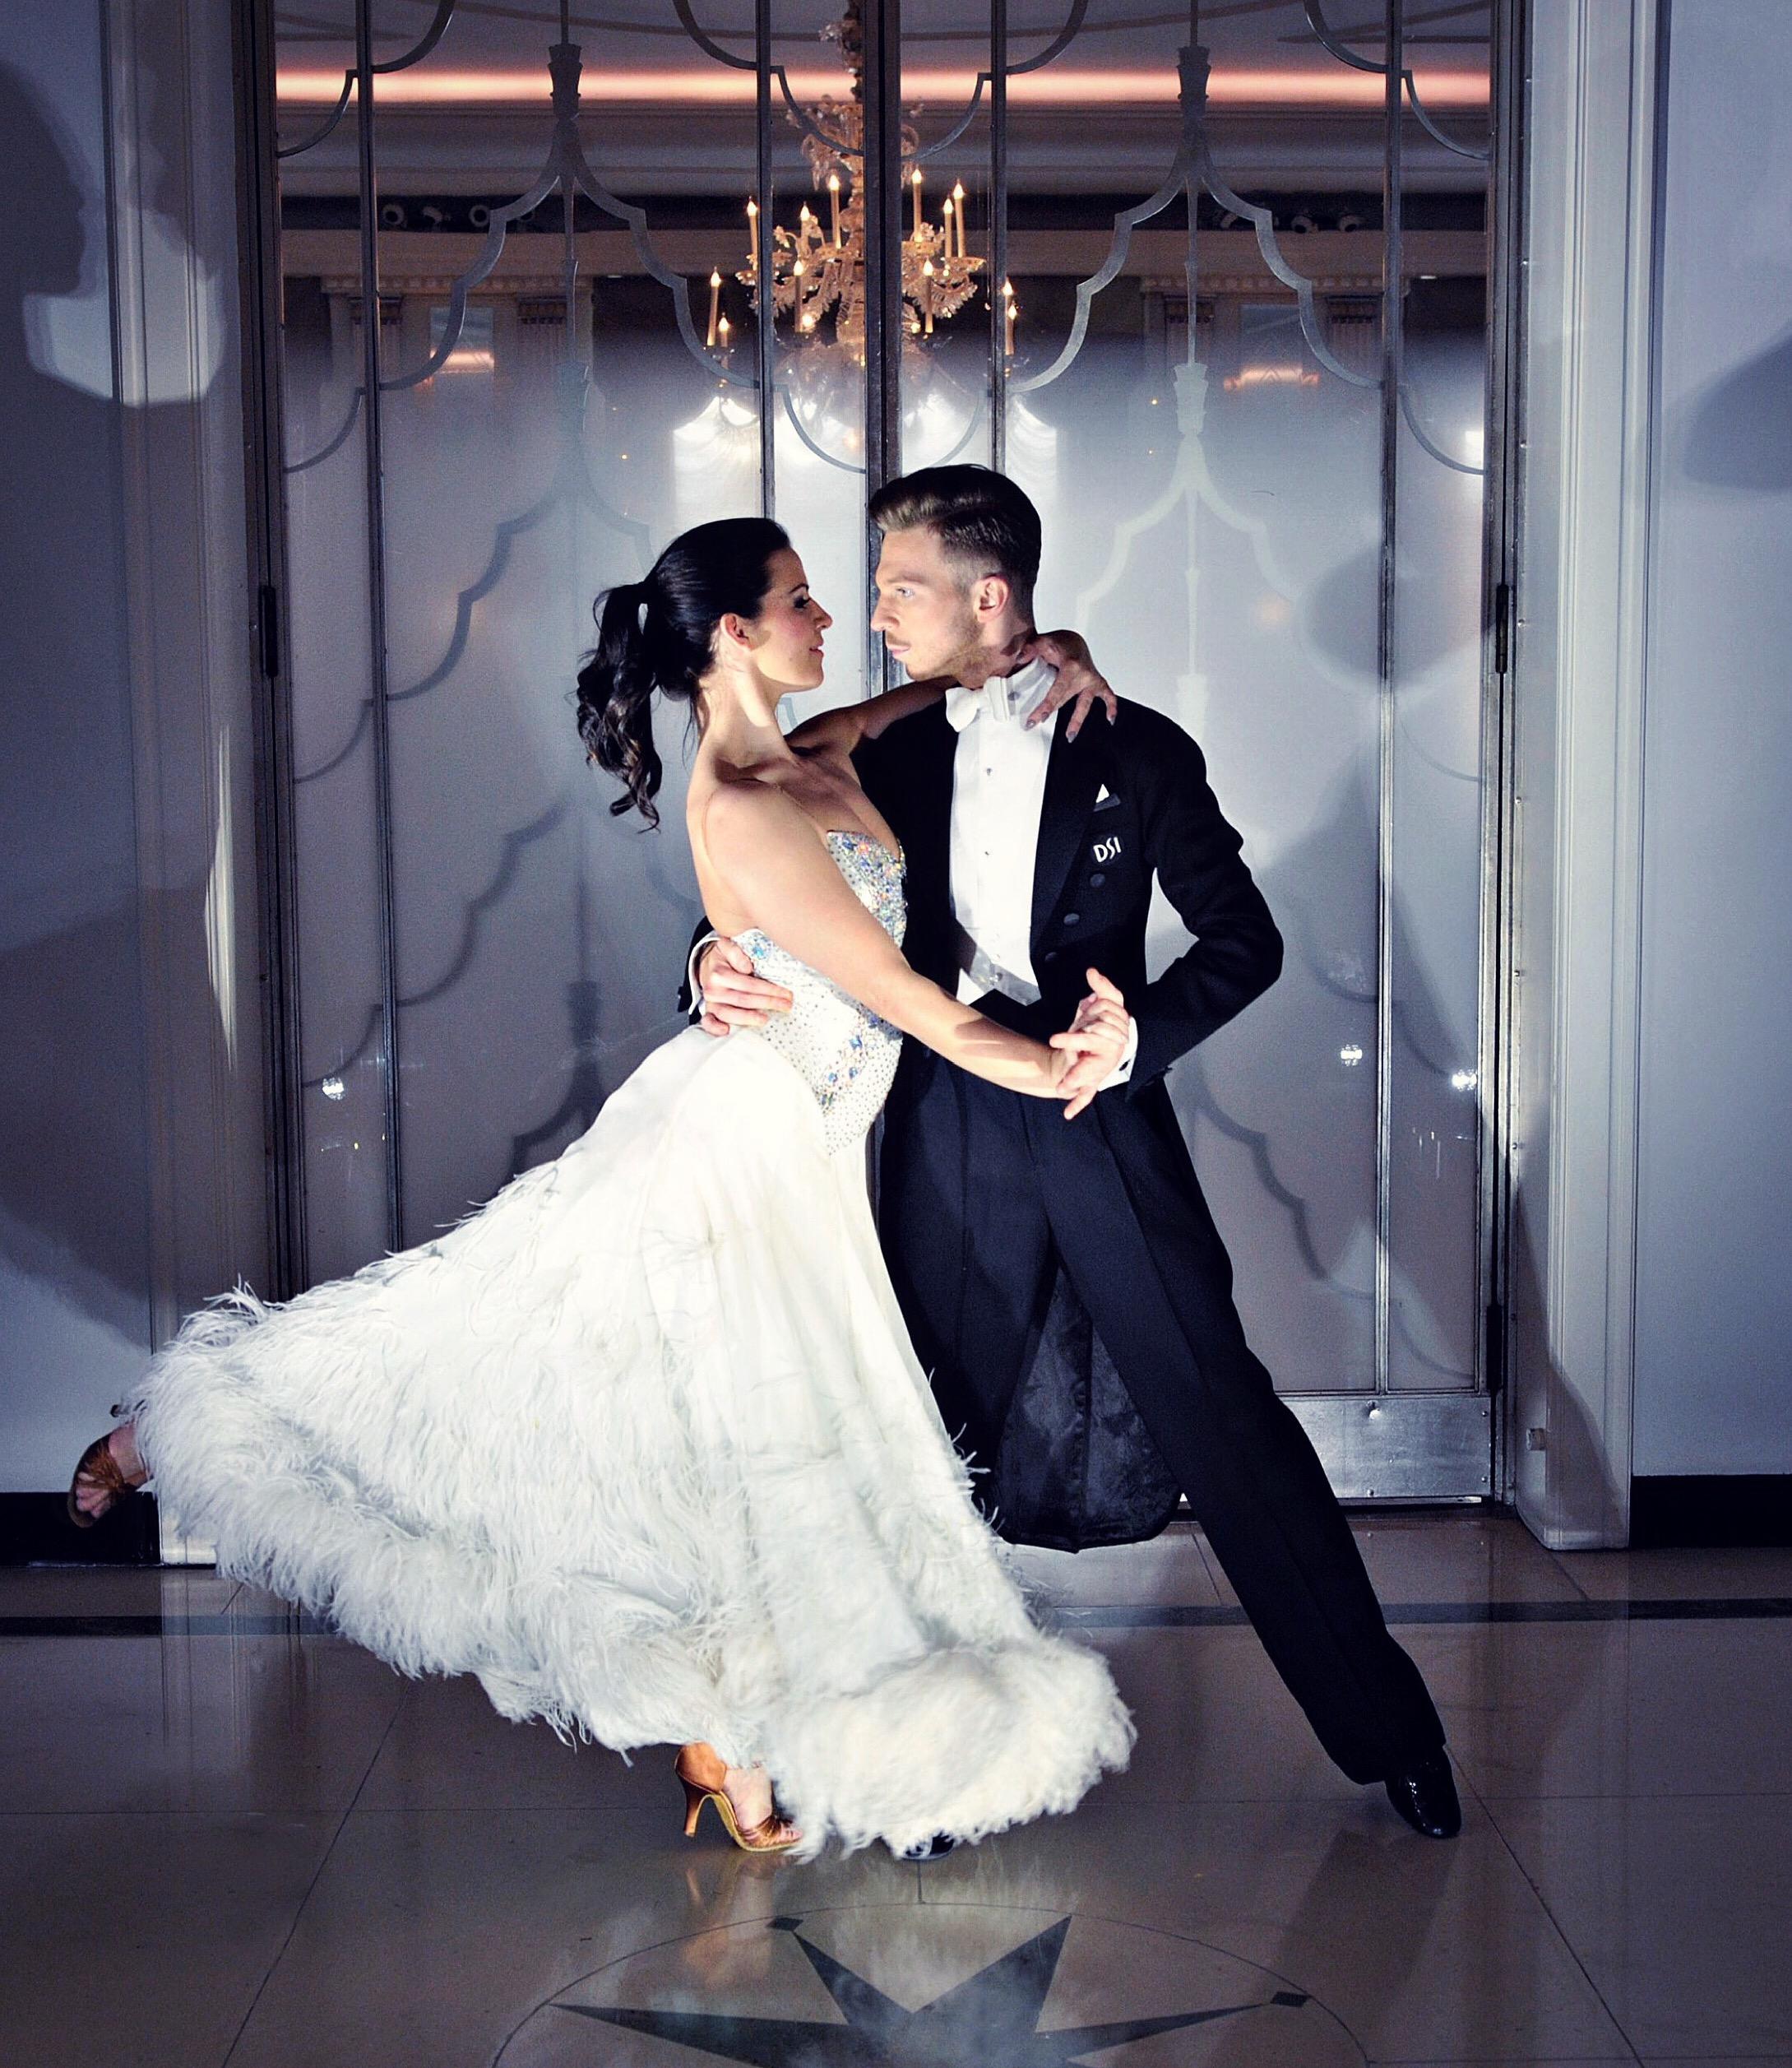 Copy of Ballroom Dance Lessons | The First Dance | Wedding Choreography | Mayfair |London |